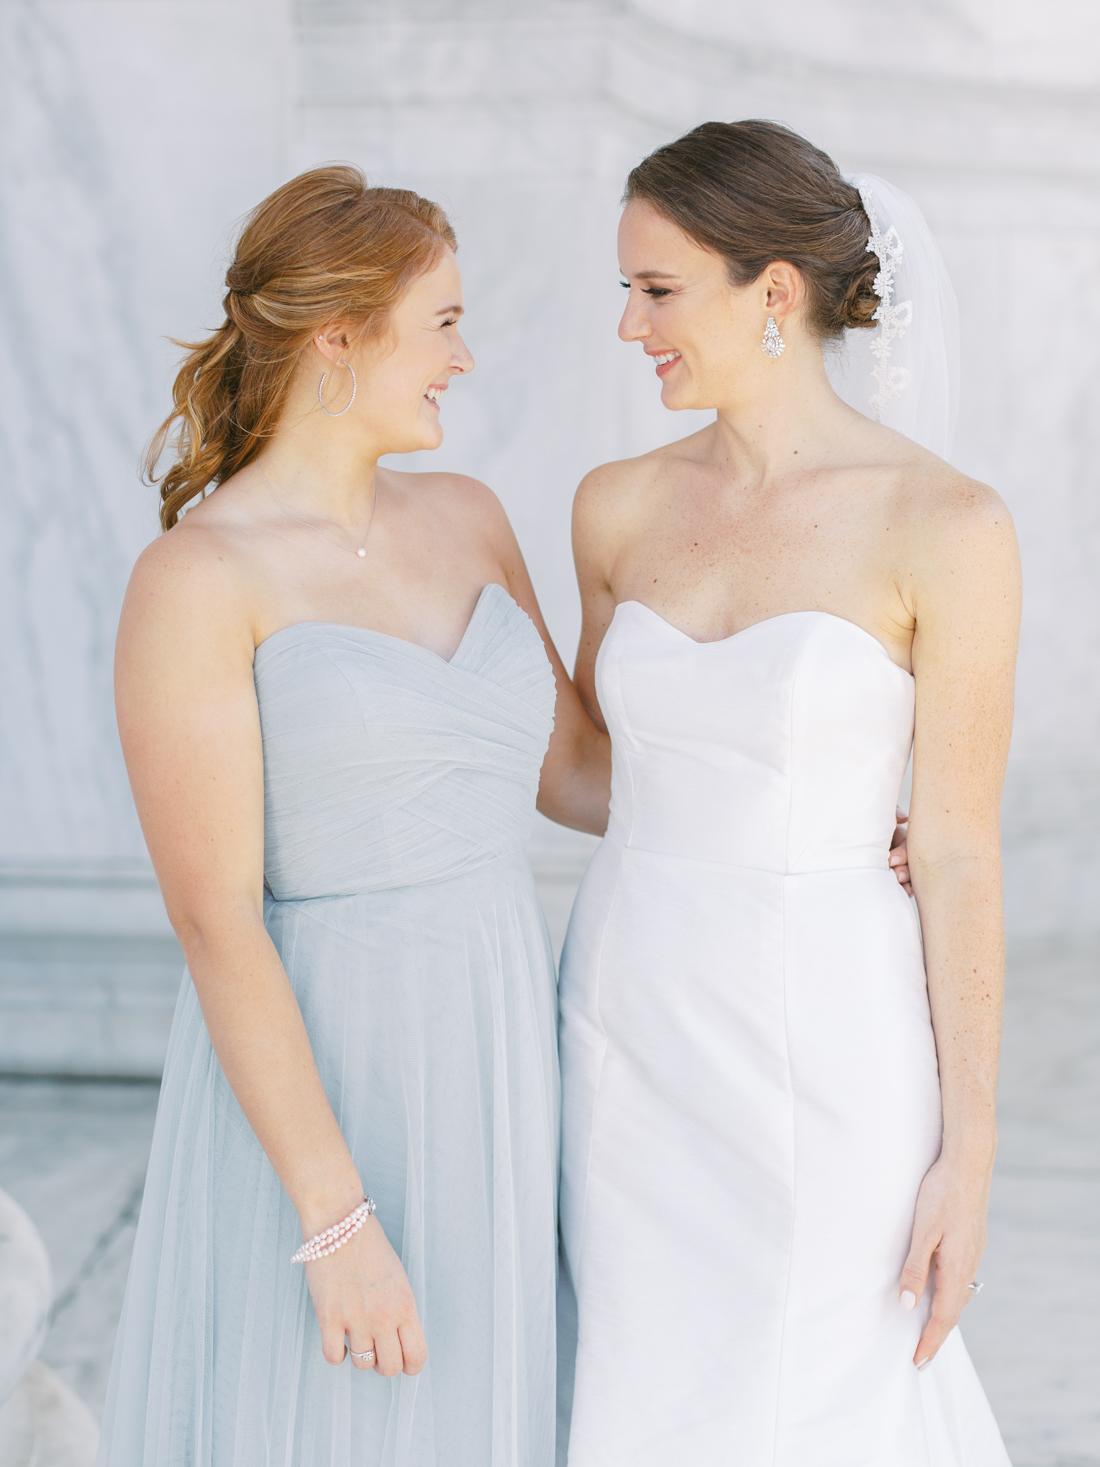 Jenny-yoo-blue-strapless-bridesmaid-wedding